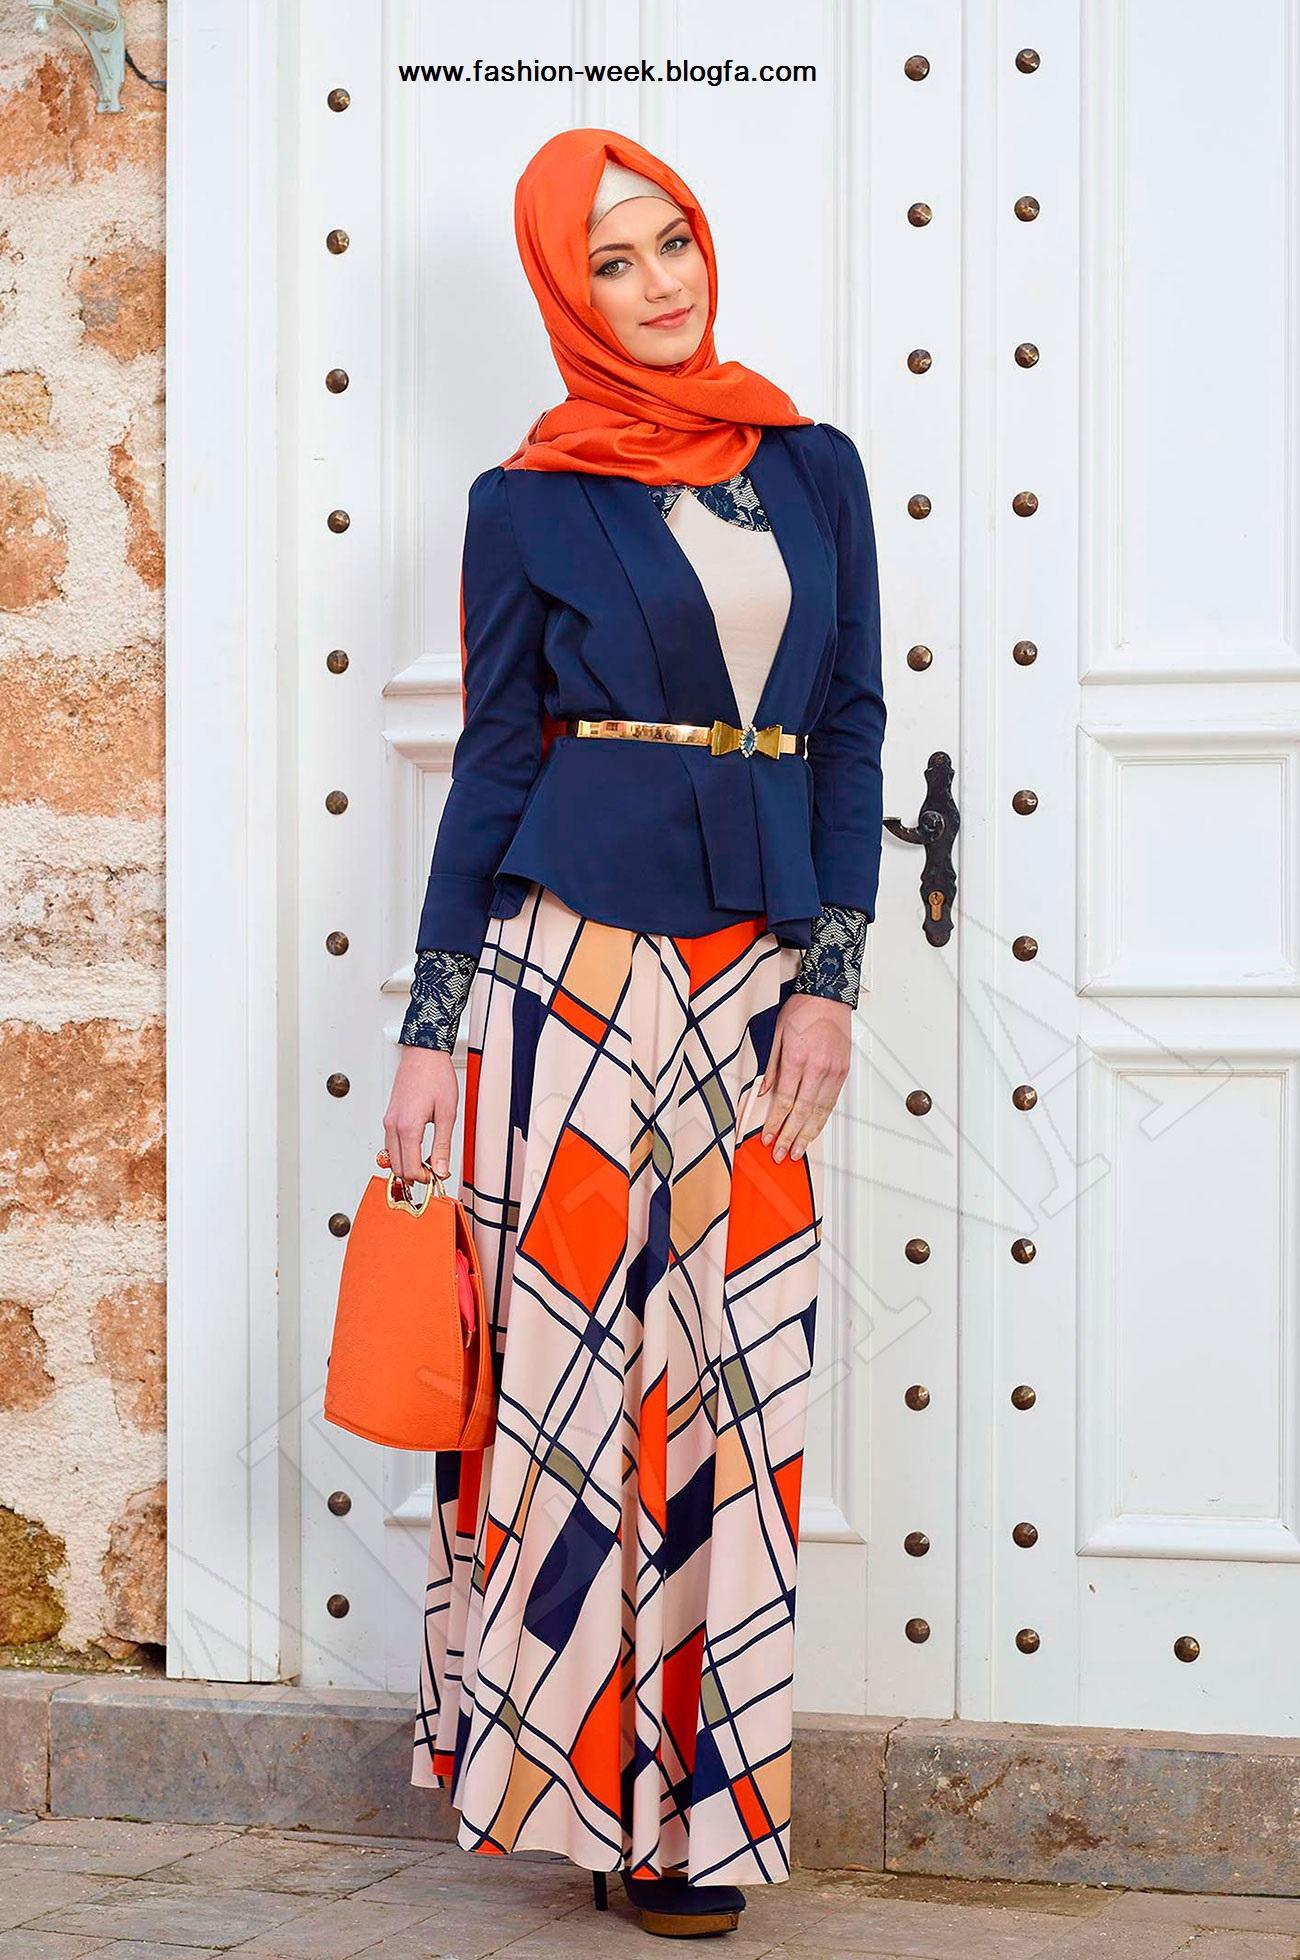 رنگ لباس سال۹۷ مانتو ریون چپ و راست الگو خیاطی مهر